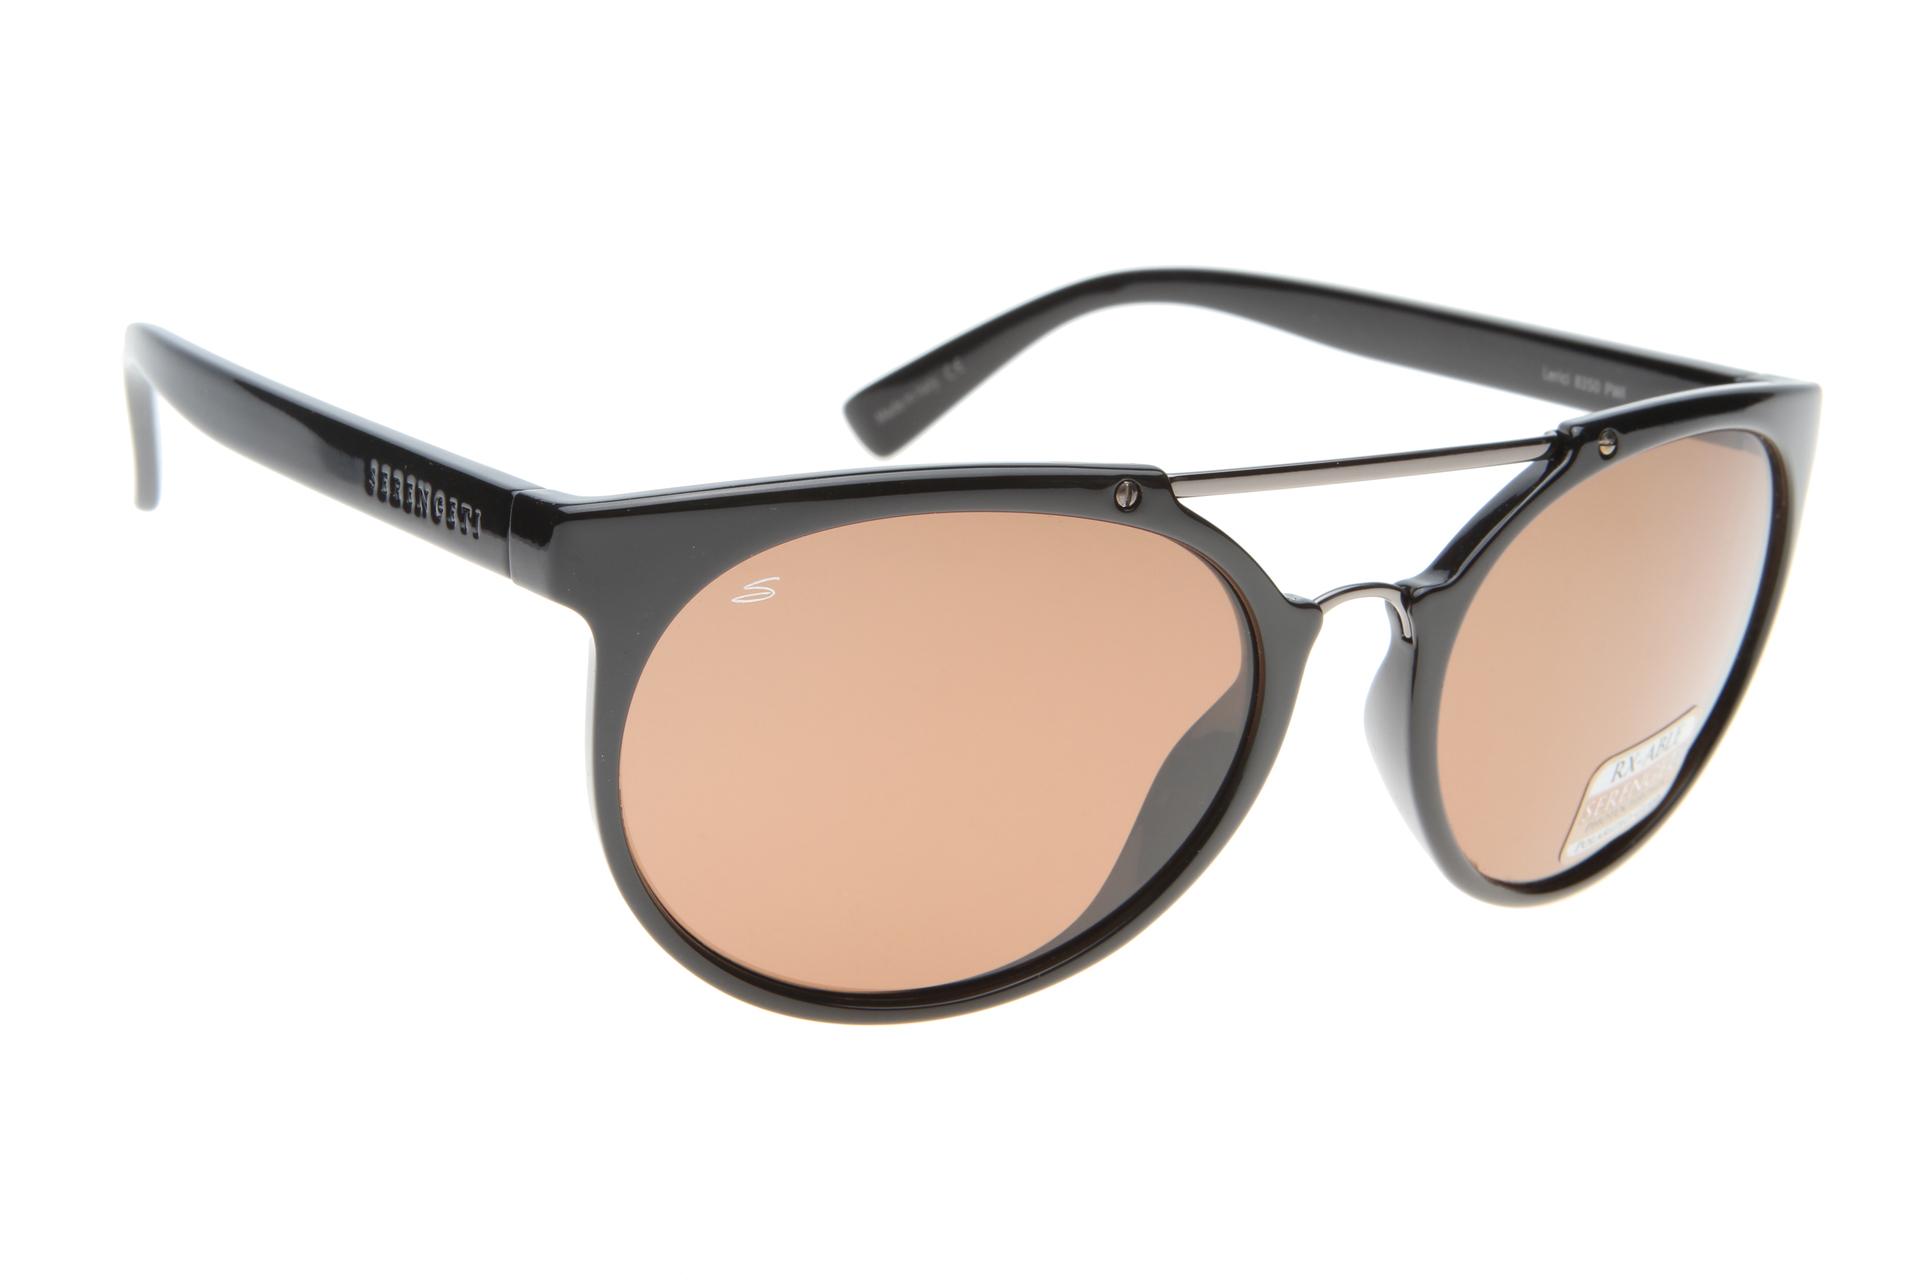 9b2bae8085cb52 Serengeti Lerici 8350 (Shiny Black) Gepolariseerd zonnebril